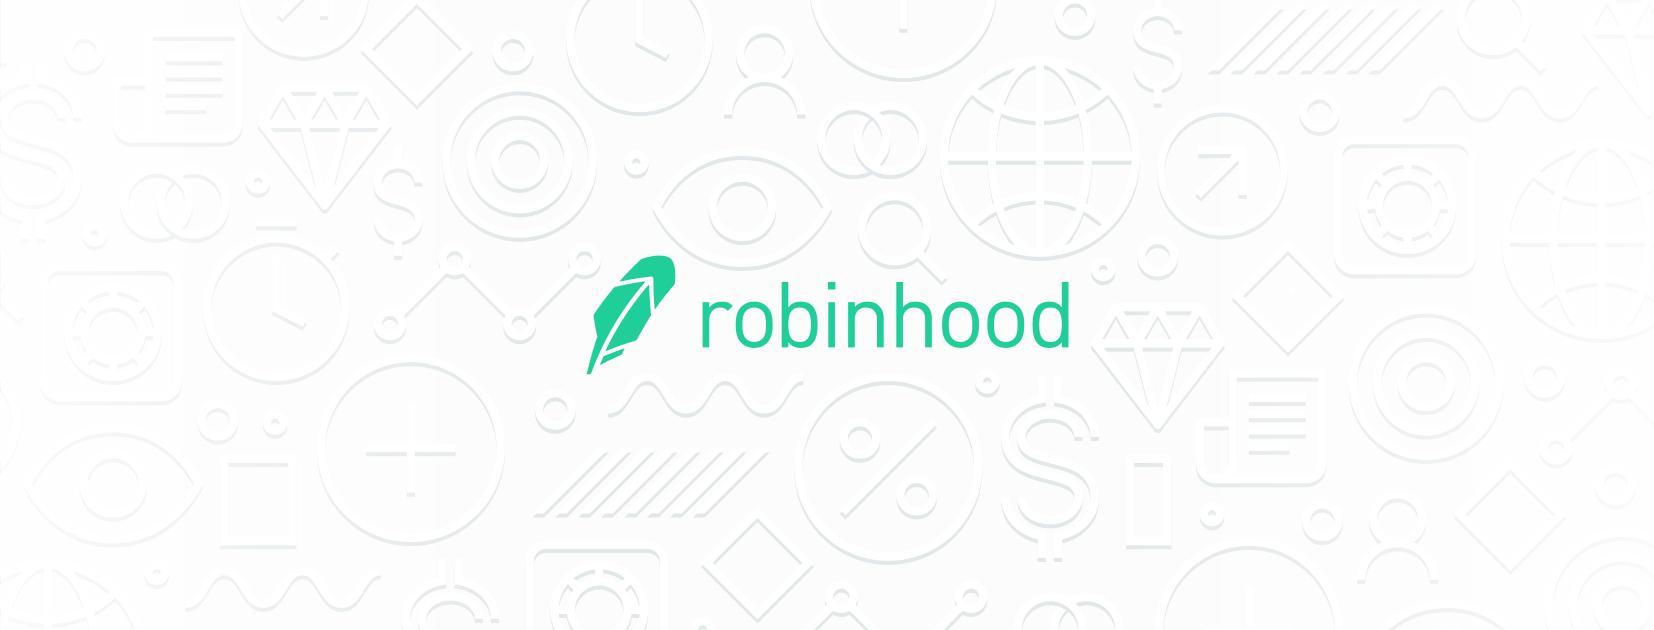 Robinhood Featured Image